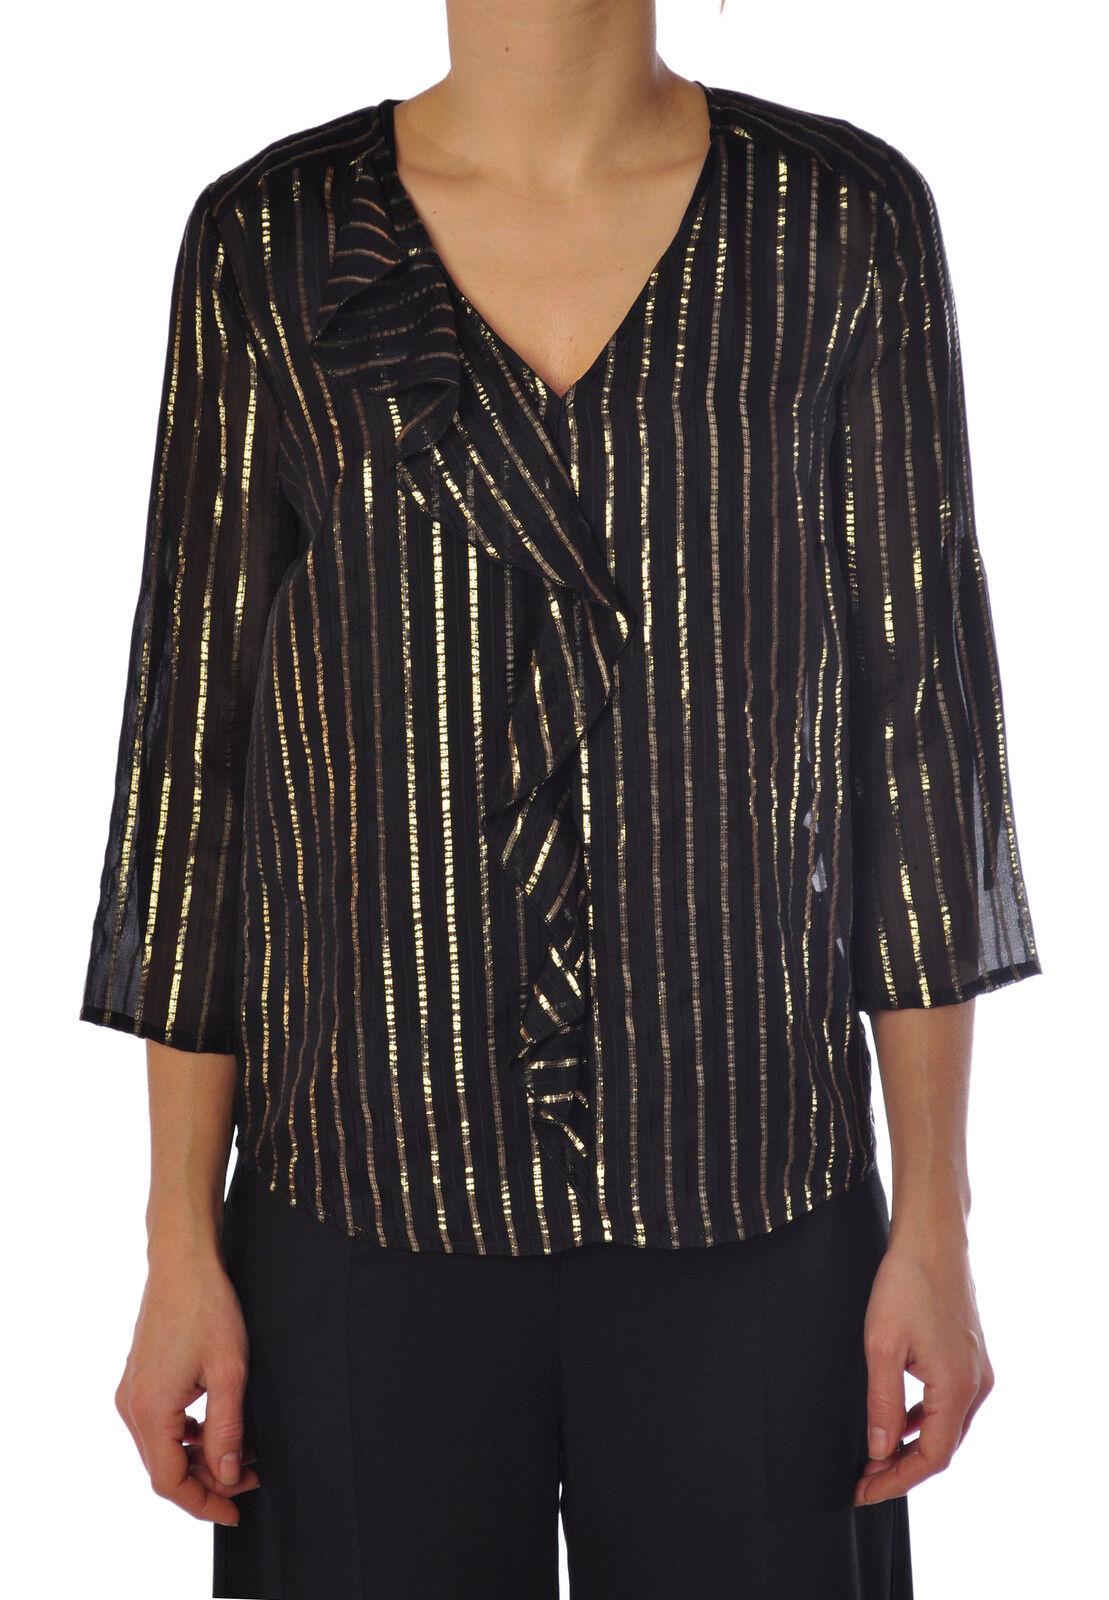 Patrizia Pepe  -  Shirt - Female - 44 - schwarz - 1343503B164044